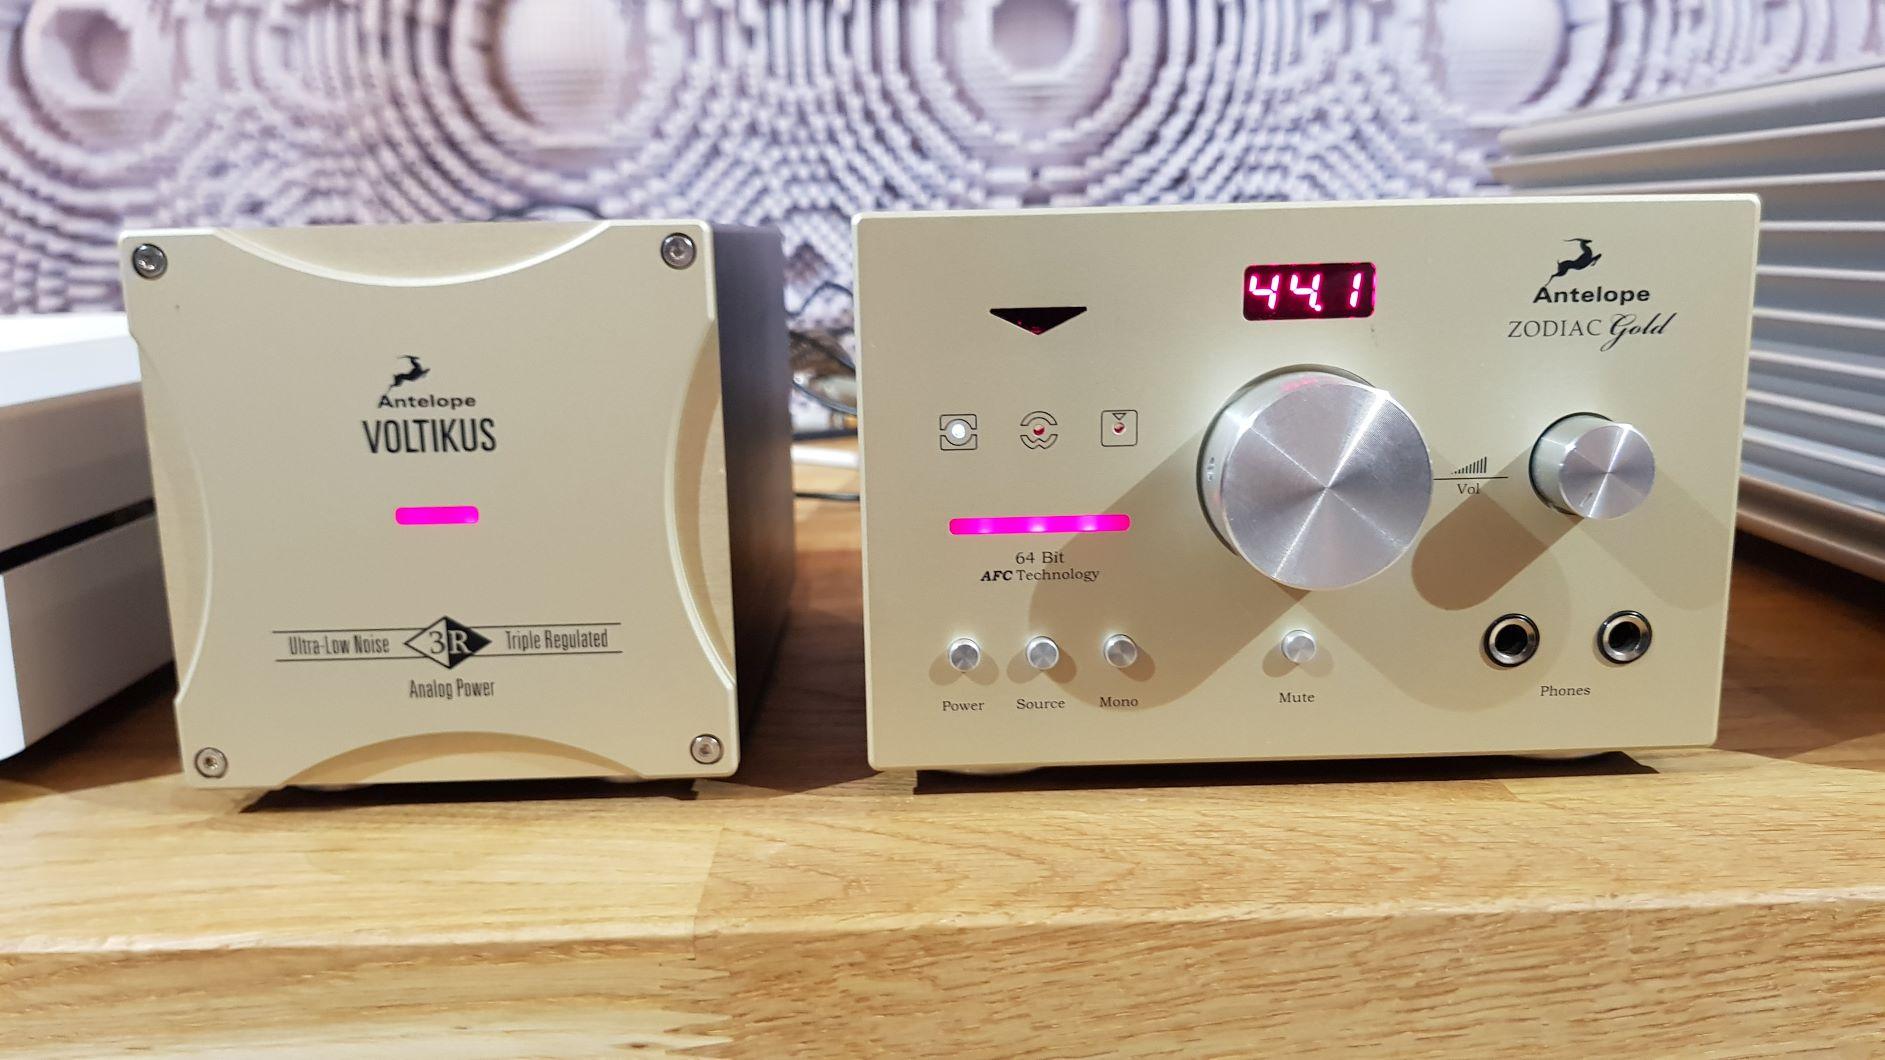 Antelope Audio Zodiac Gold+Voltikus dac + pre